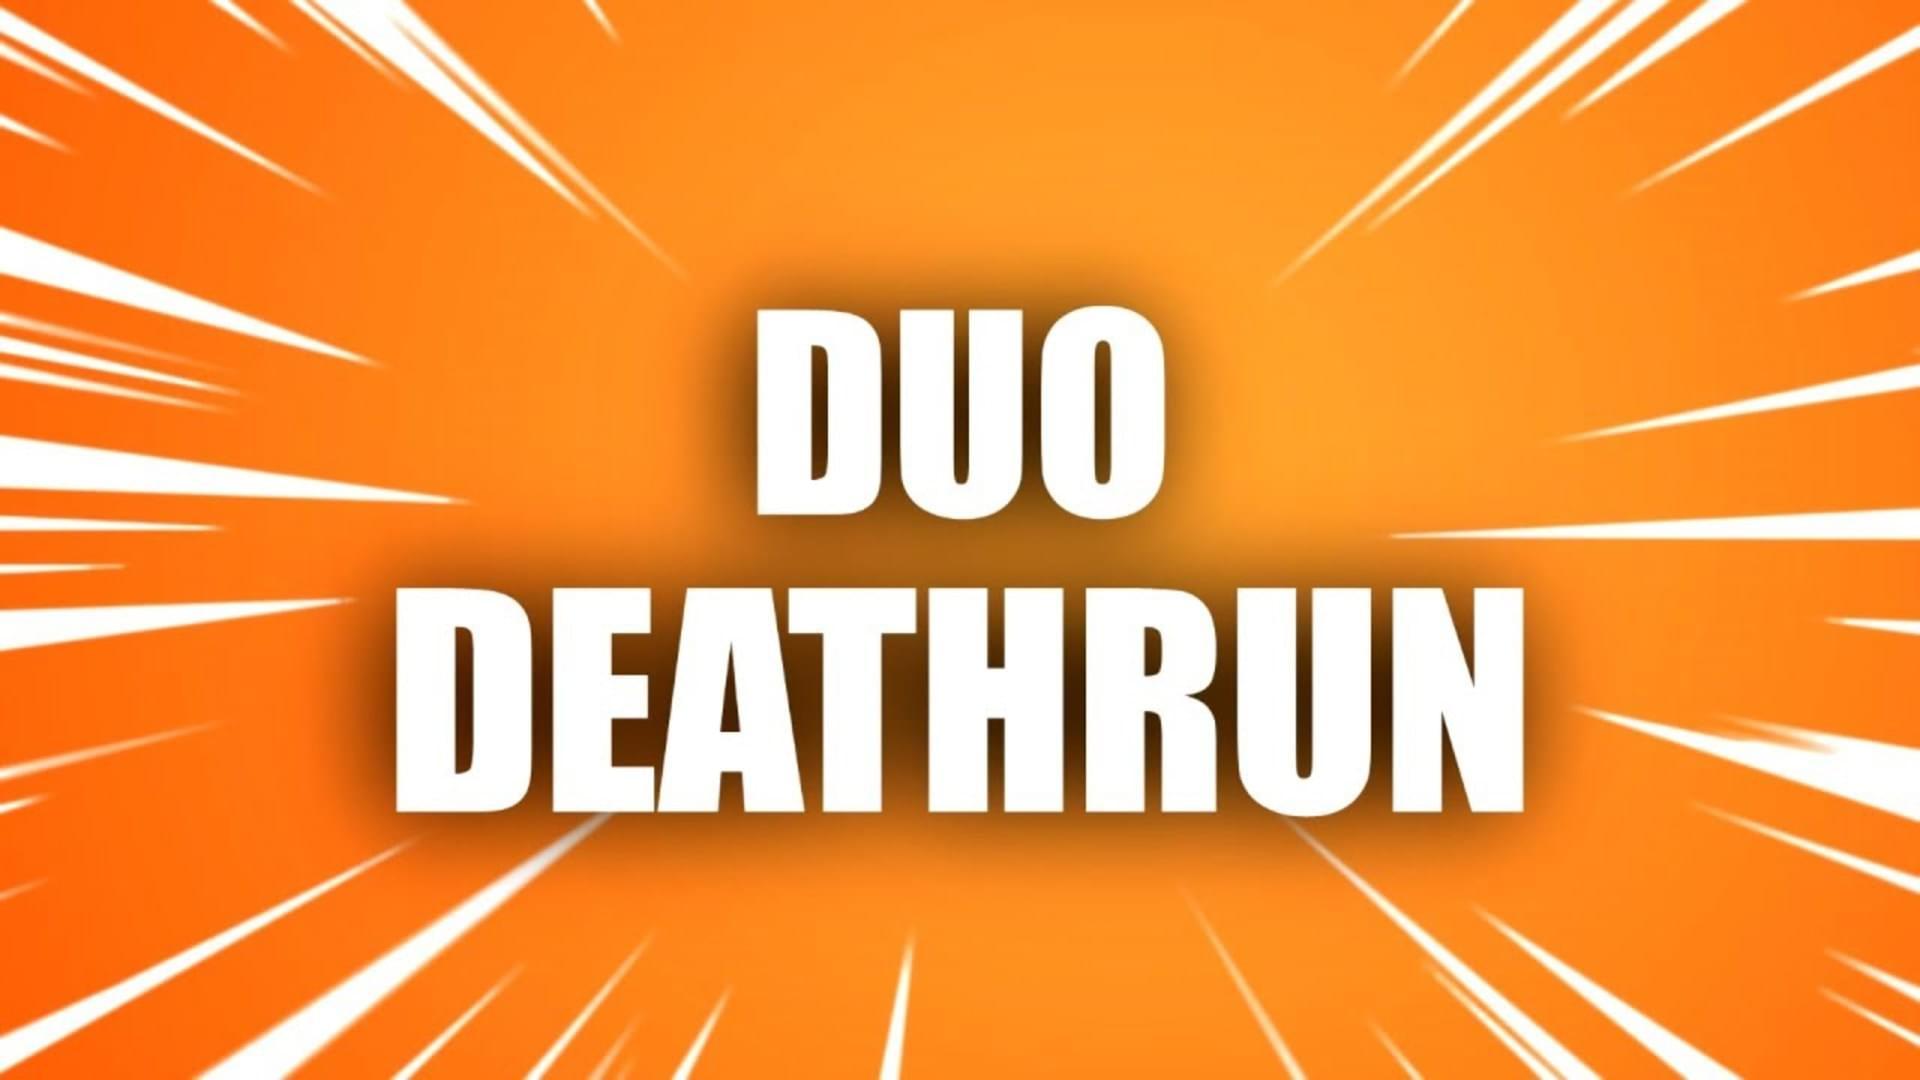 Duo Deathrun Code Fortnite Creative | Fortnite Aimbot Switch